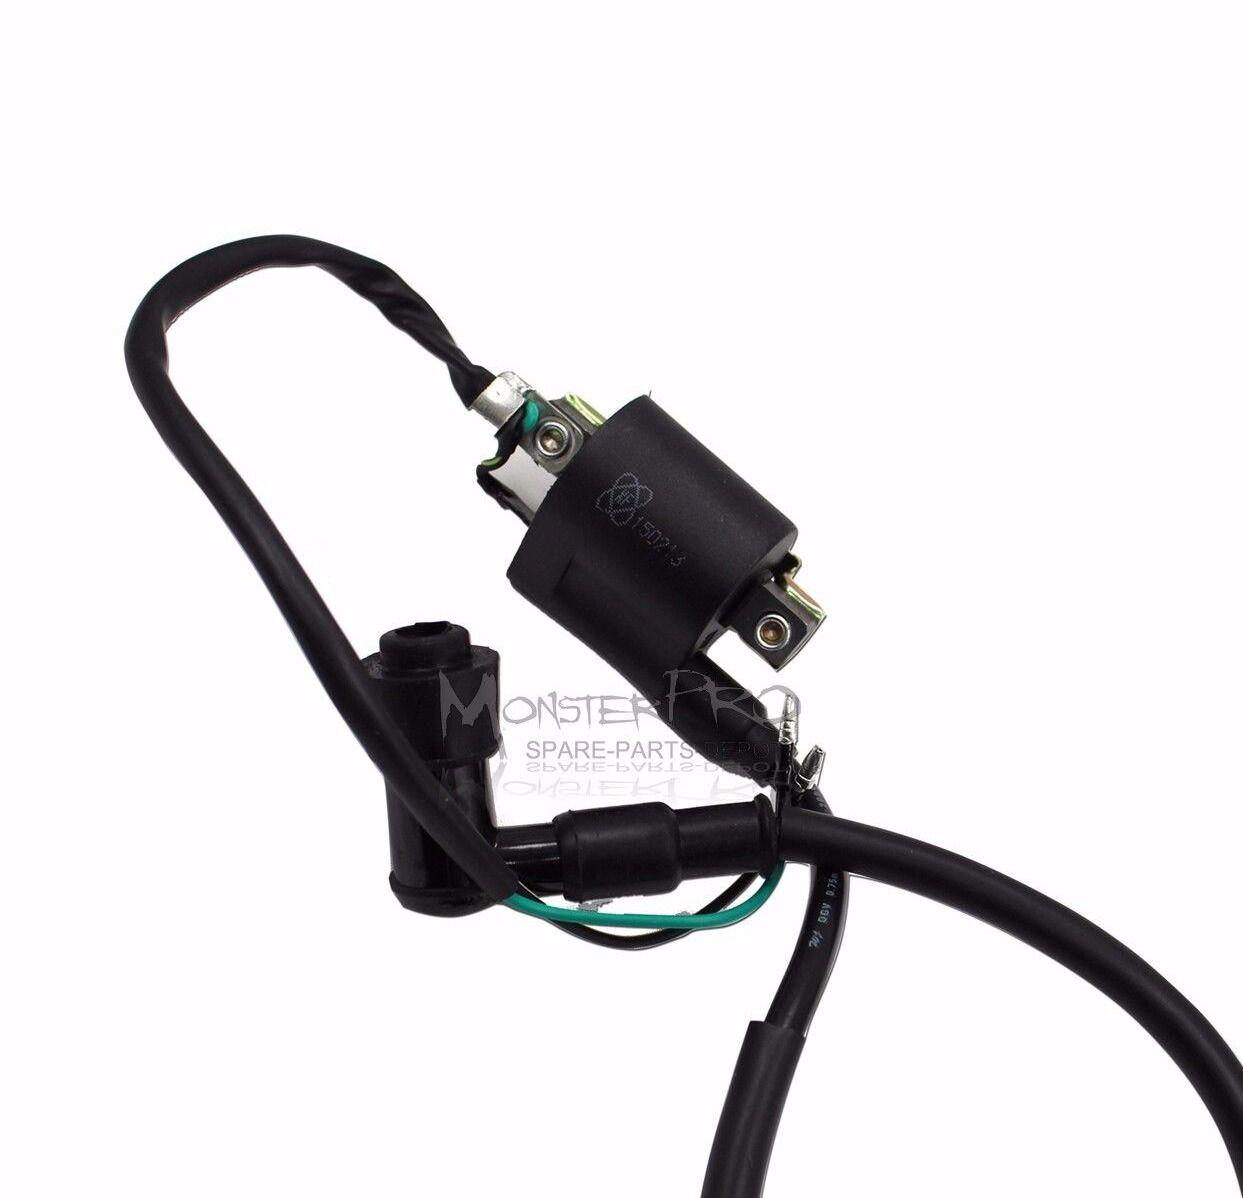 full wire loom wiring harness cc cc cc cc atv quad full wire loom wiring harness 150cc 200cc 250cc 300cc atv quad bike buggy gokart